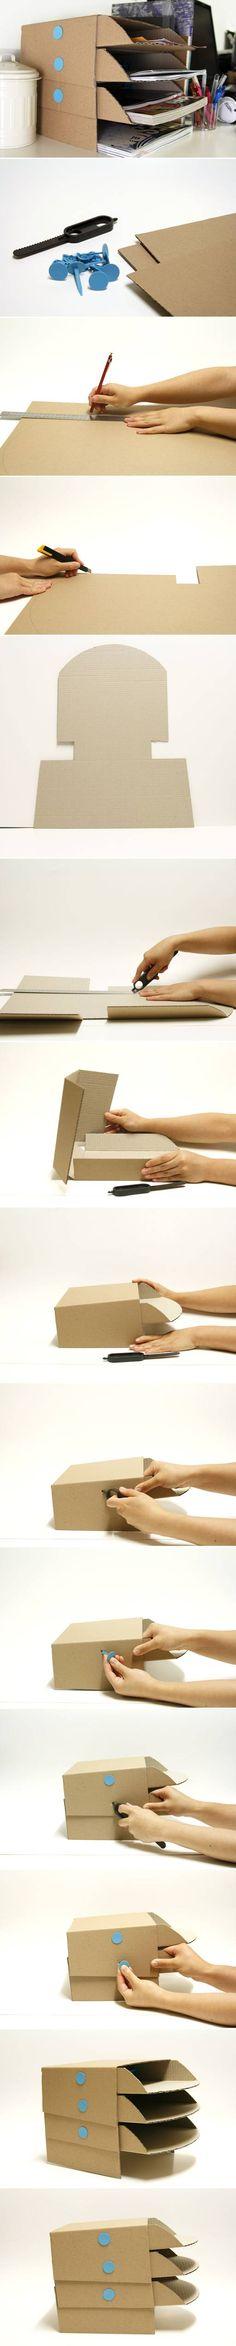 DIY Cardboard office Desktop storage Trays (DIY Creative Ideas)